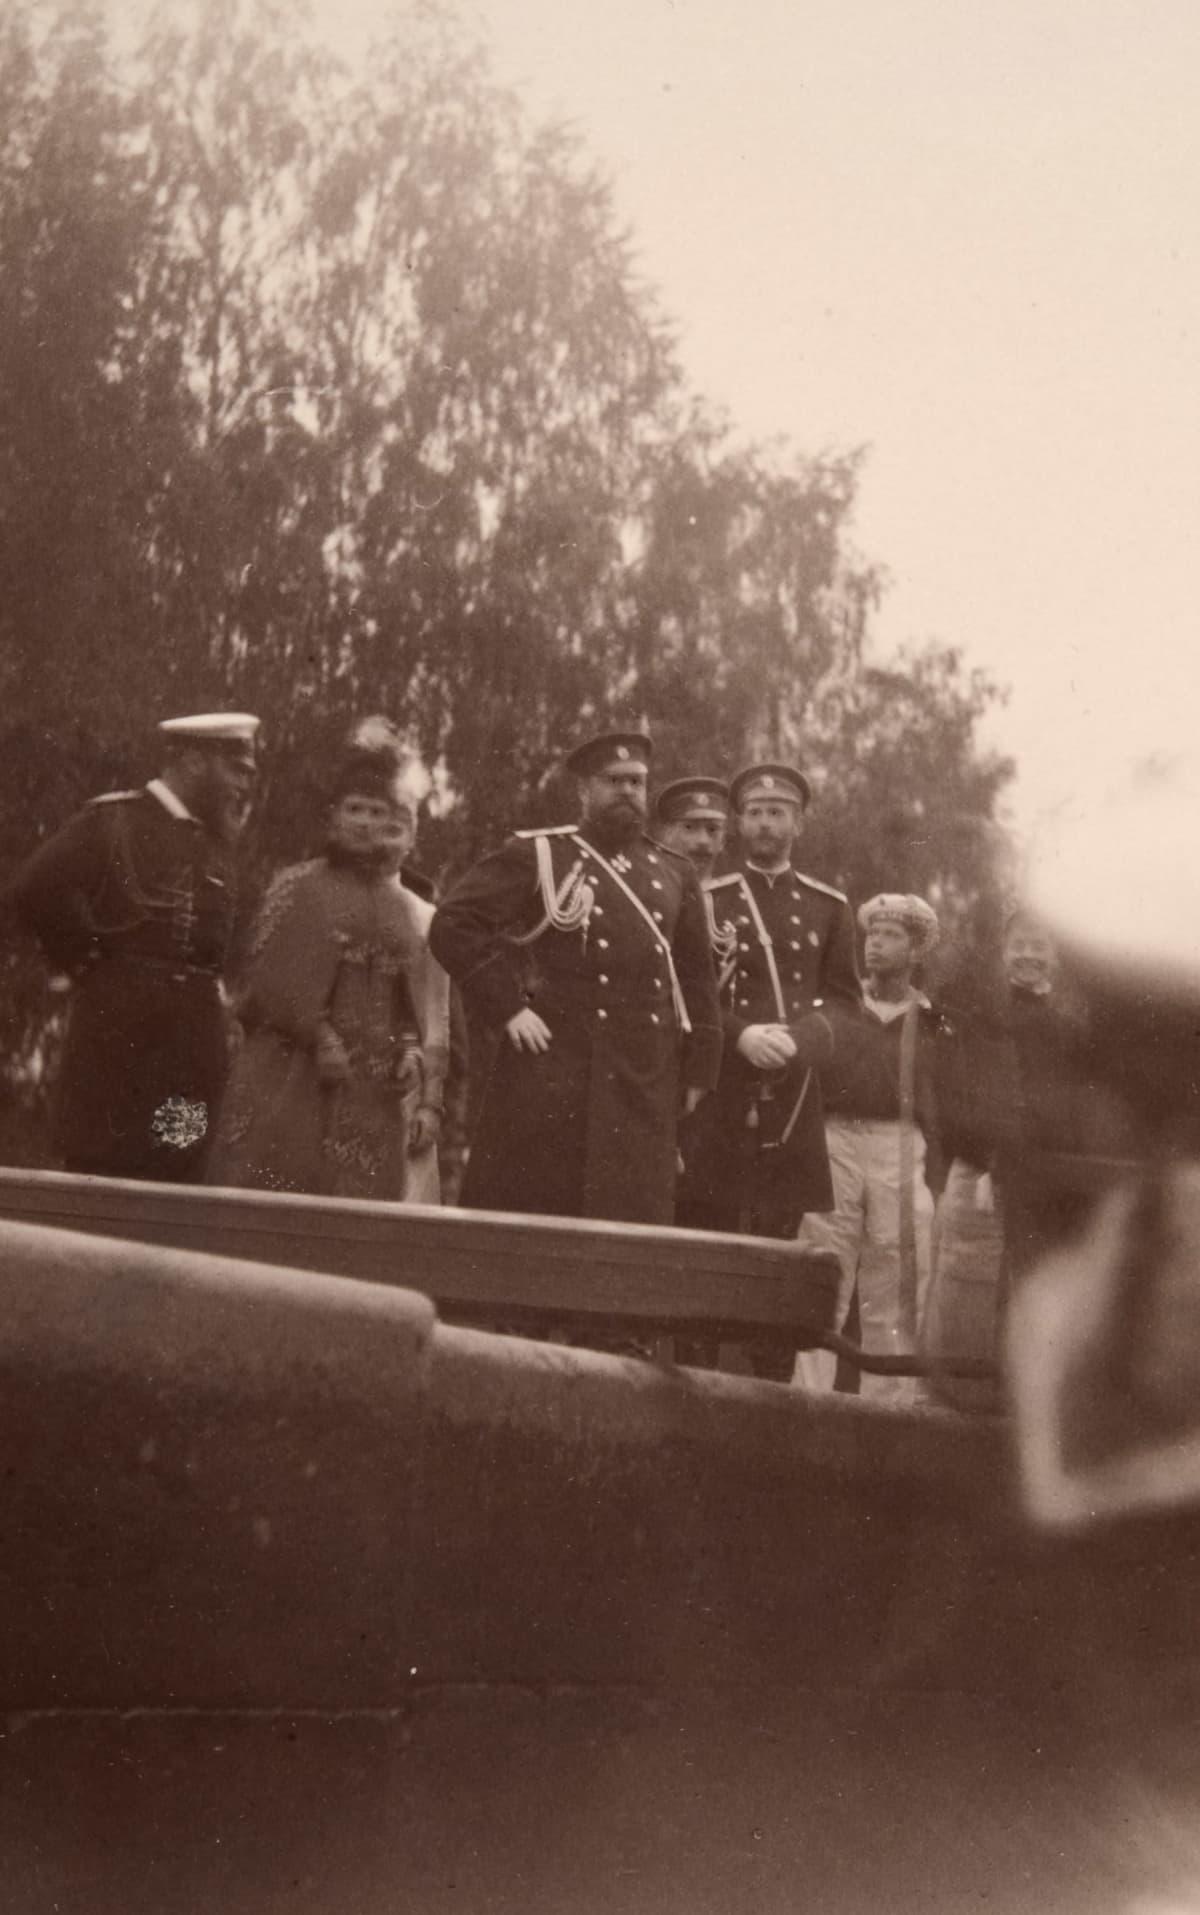 keisari Aleksanteri III ja keisarinna Maria Feodorovna kuvassa keskellä Saimaan kanavan reunalla.